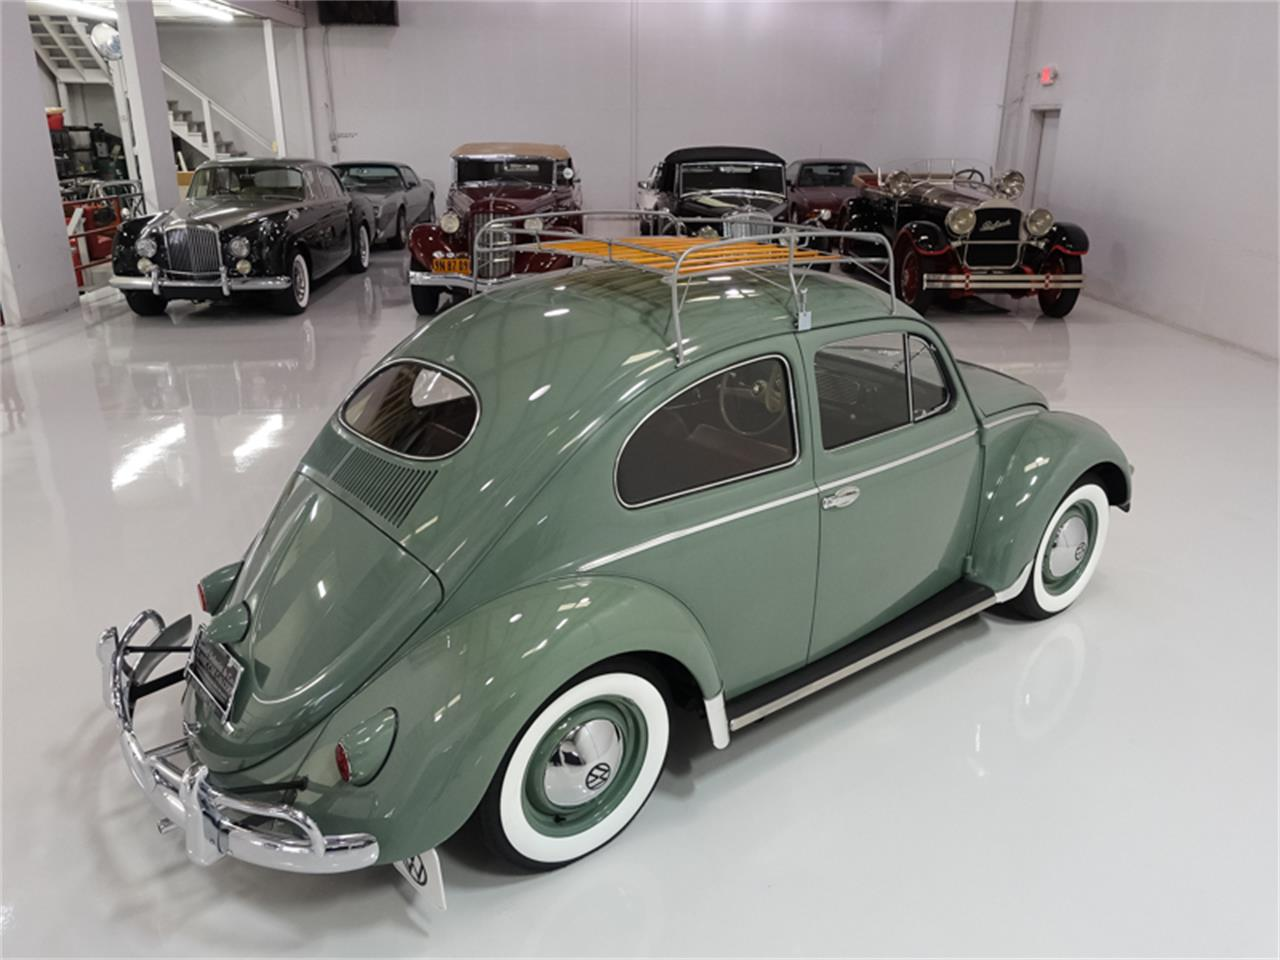 1957 Volkswagen Beetle For Sale Classiccars Com Cc 912583